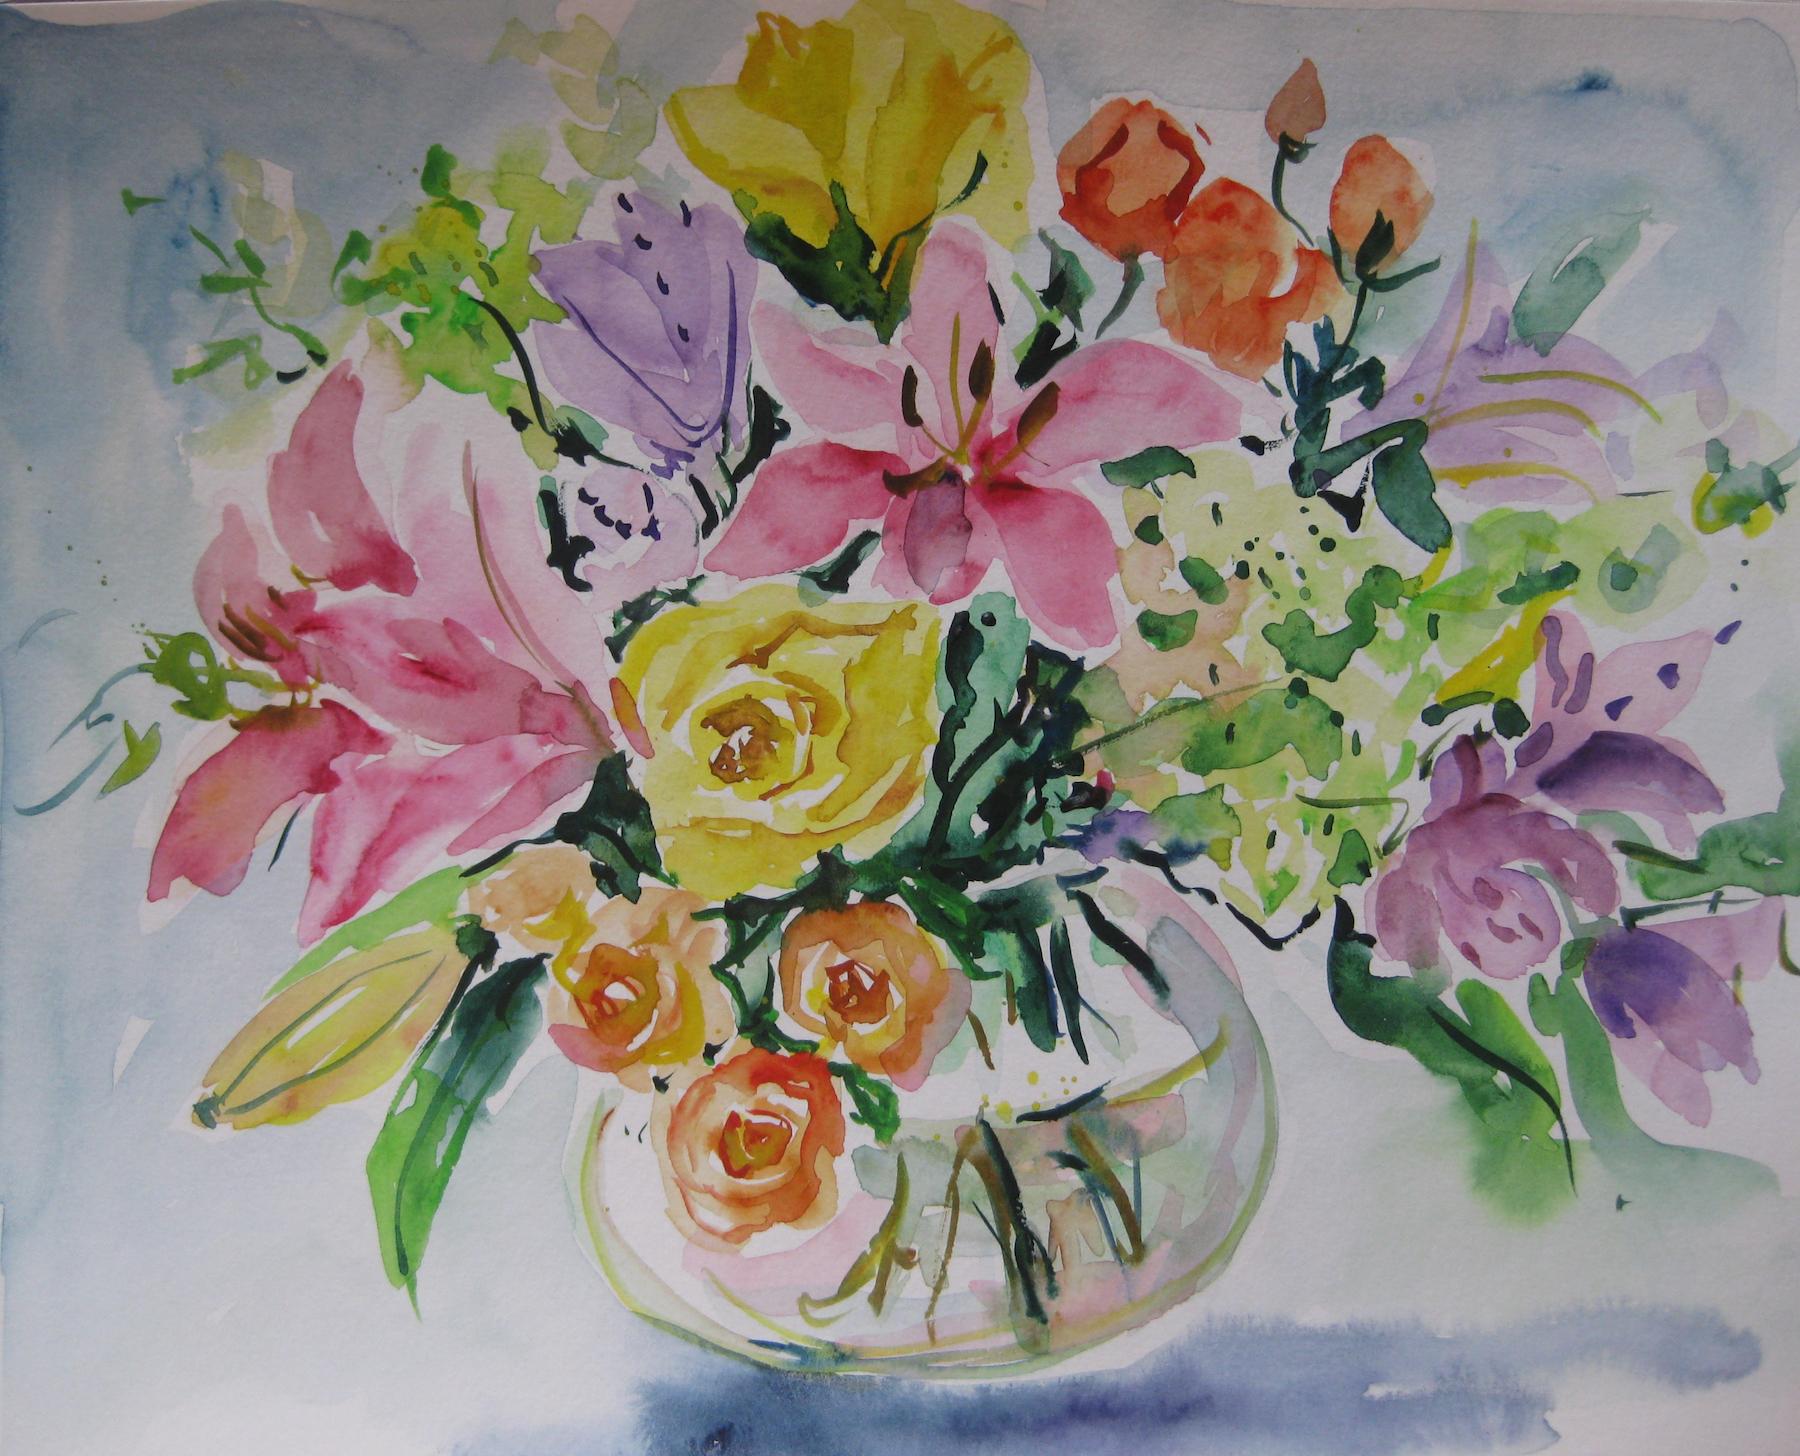 Watercolor Study IV